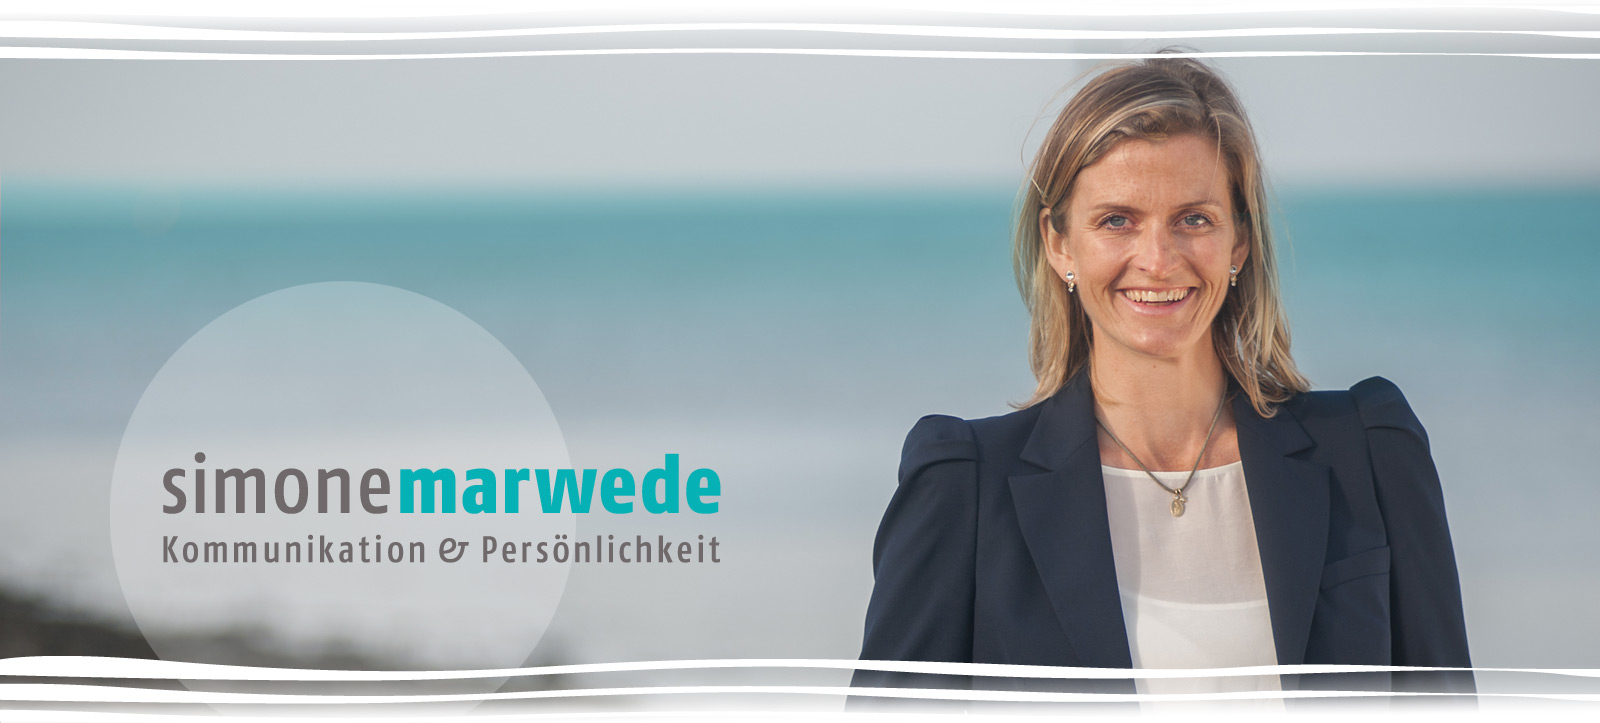 images-simone-marwede-psychologin-moderatorin-sylt